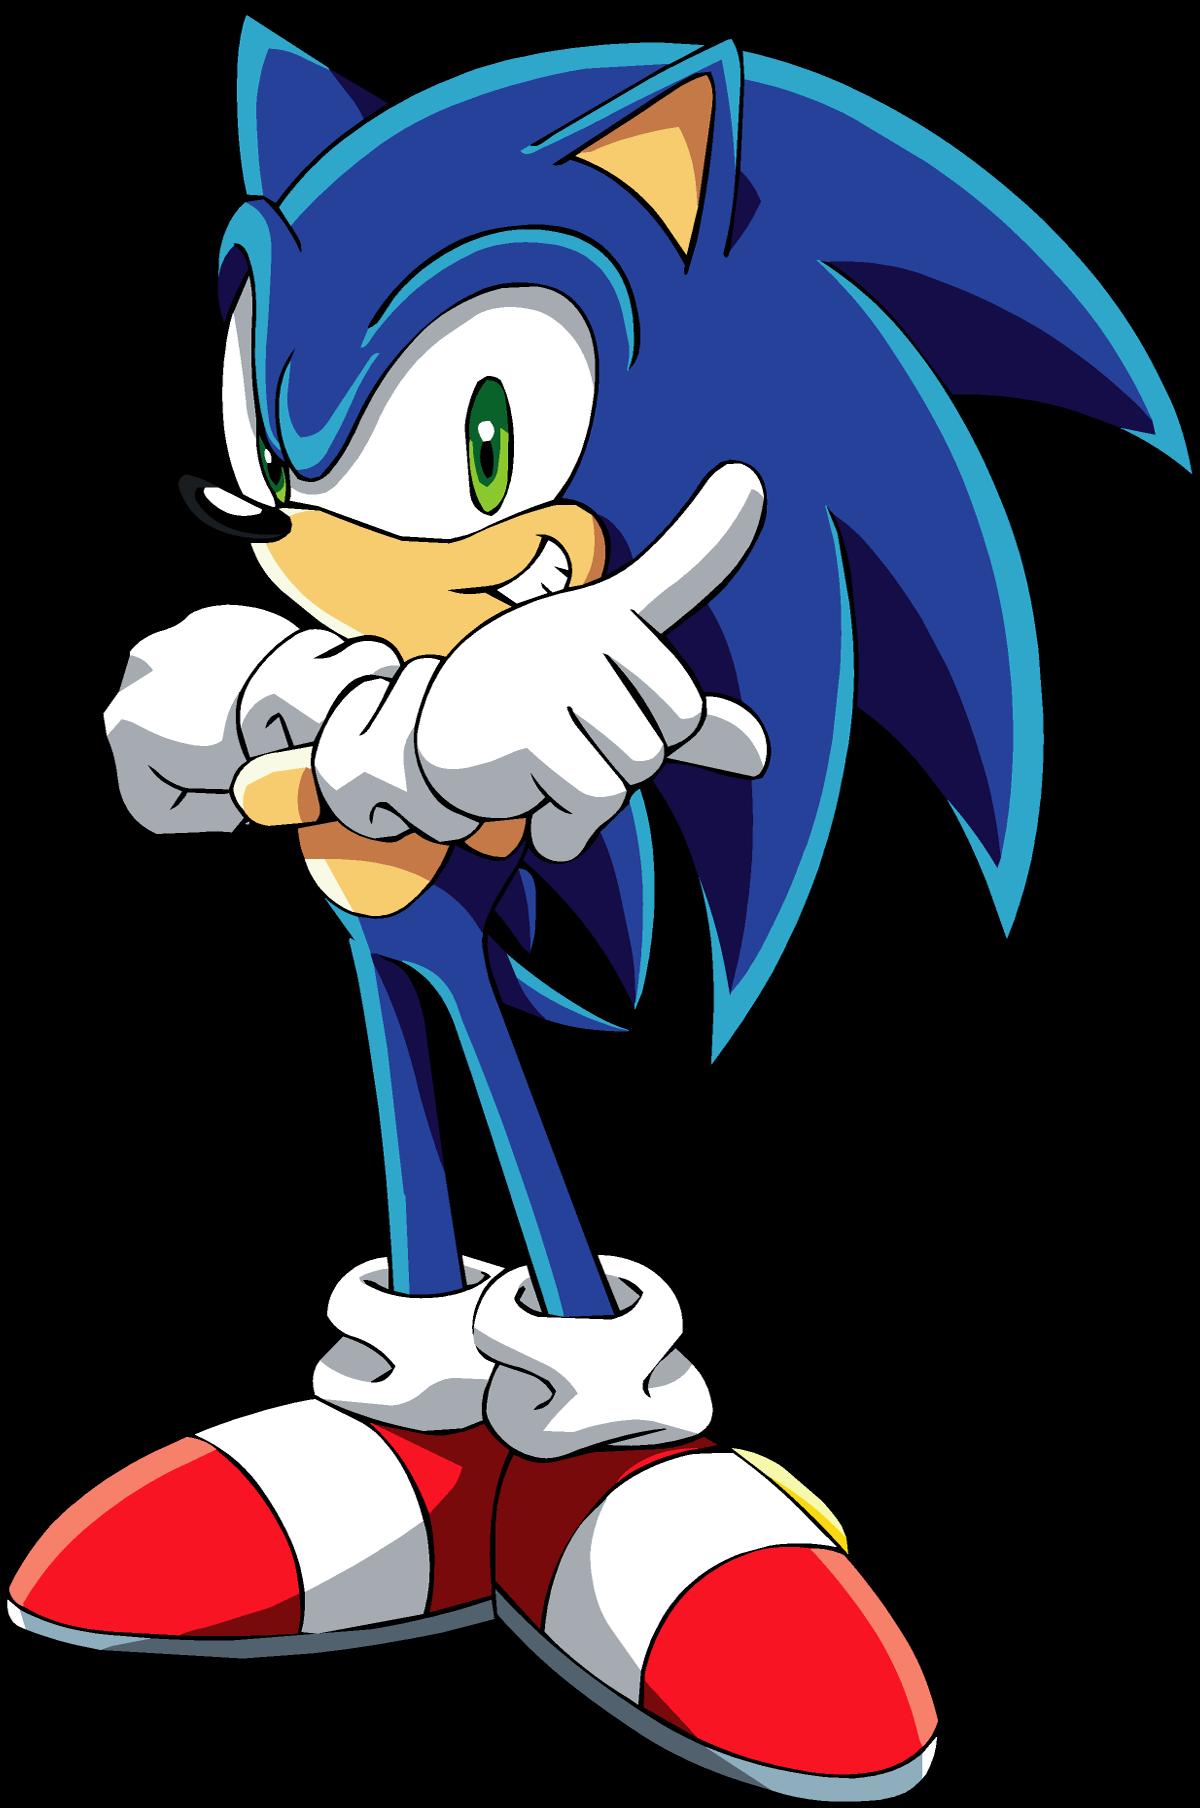 Sonic the x news. Hedgehog clipart sad